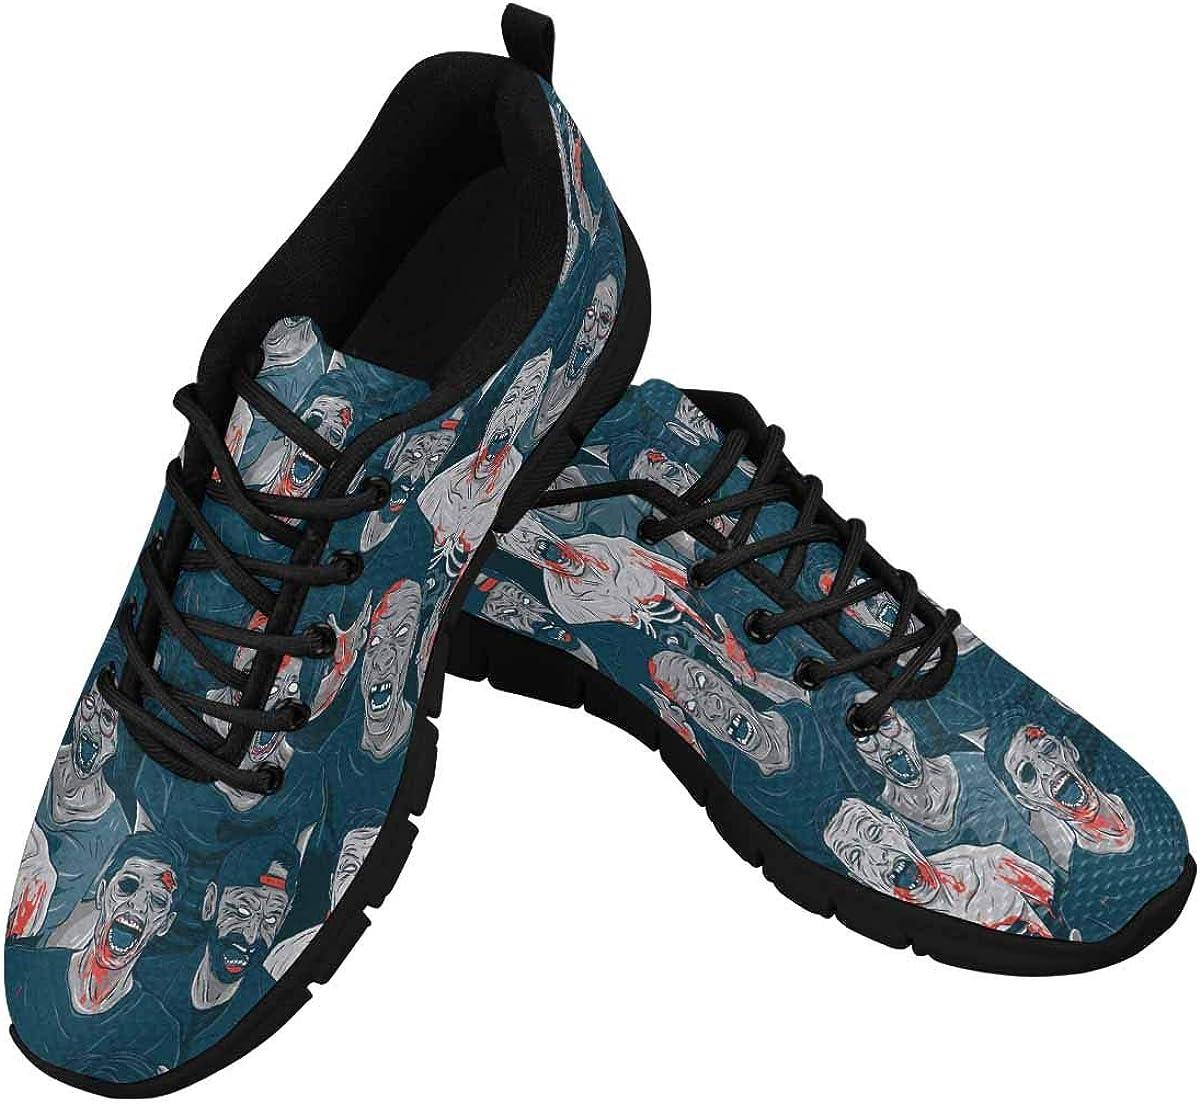 INTERESTPRINT Zombies Pattern Women Walking Shoes Comfortable Lightweight Work Casual Travel Sneakers